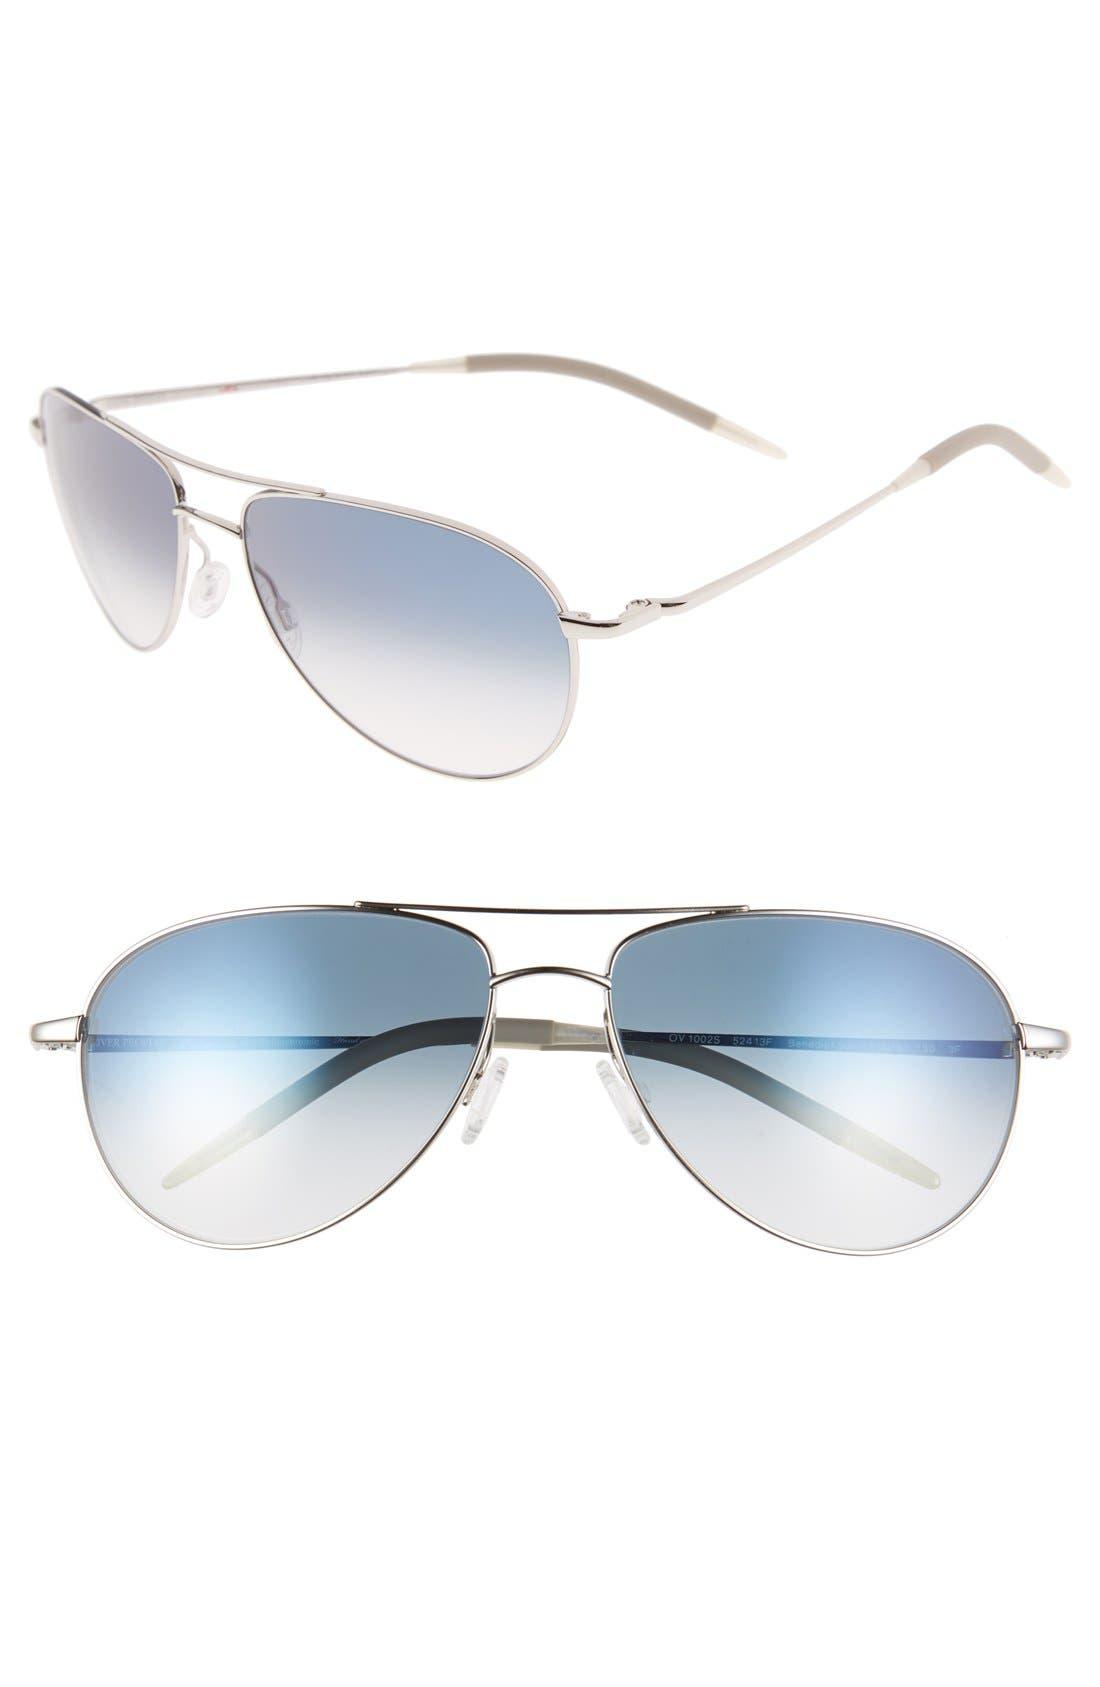 'Benedict' 59mm Gradient Aviator Sunglasses,                         Main,                         color, Silver/ Chrome Sapphire